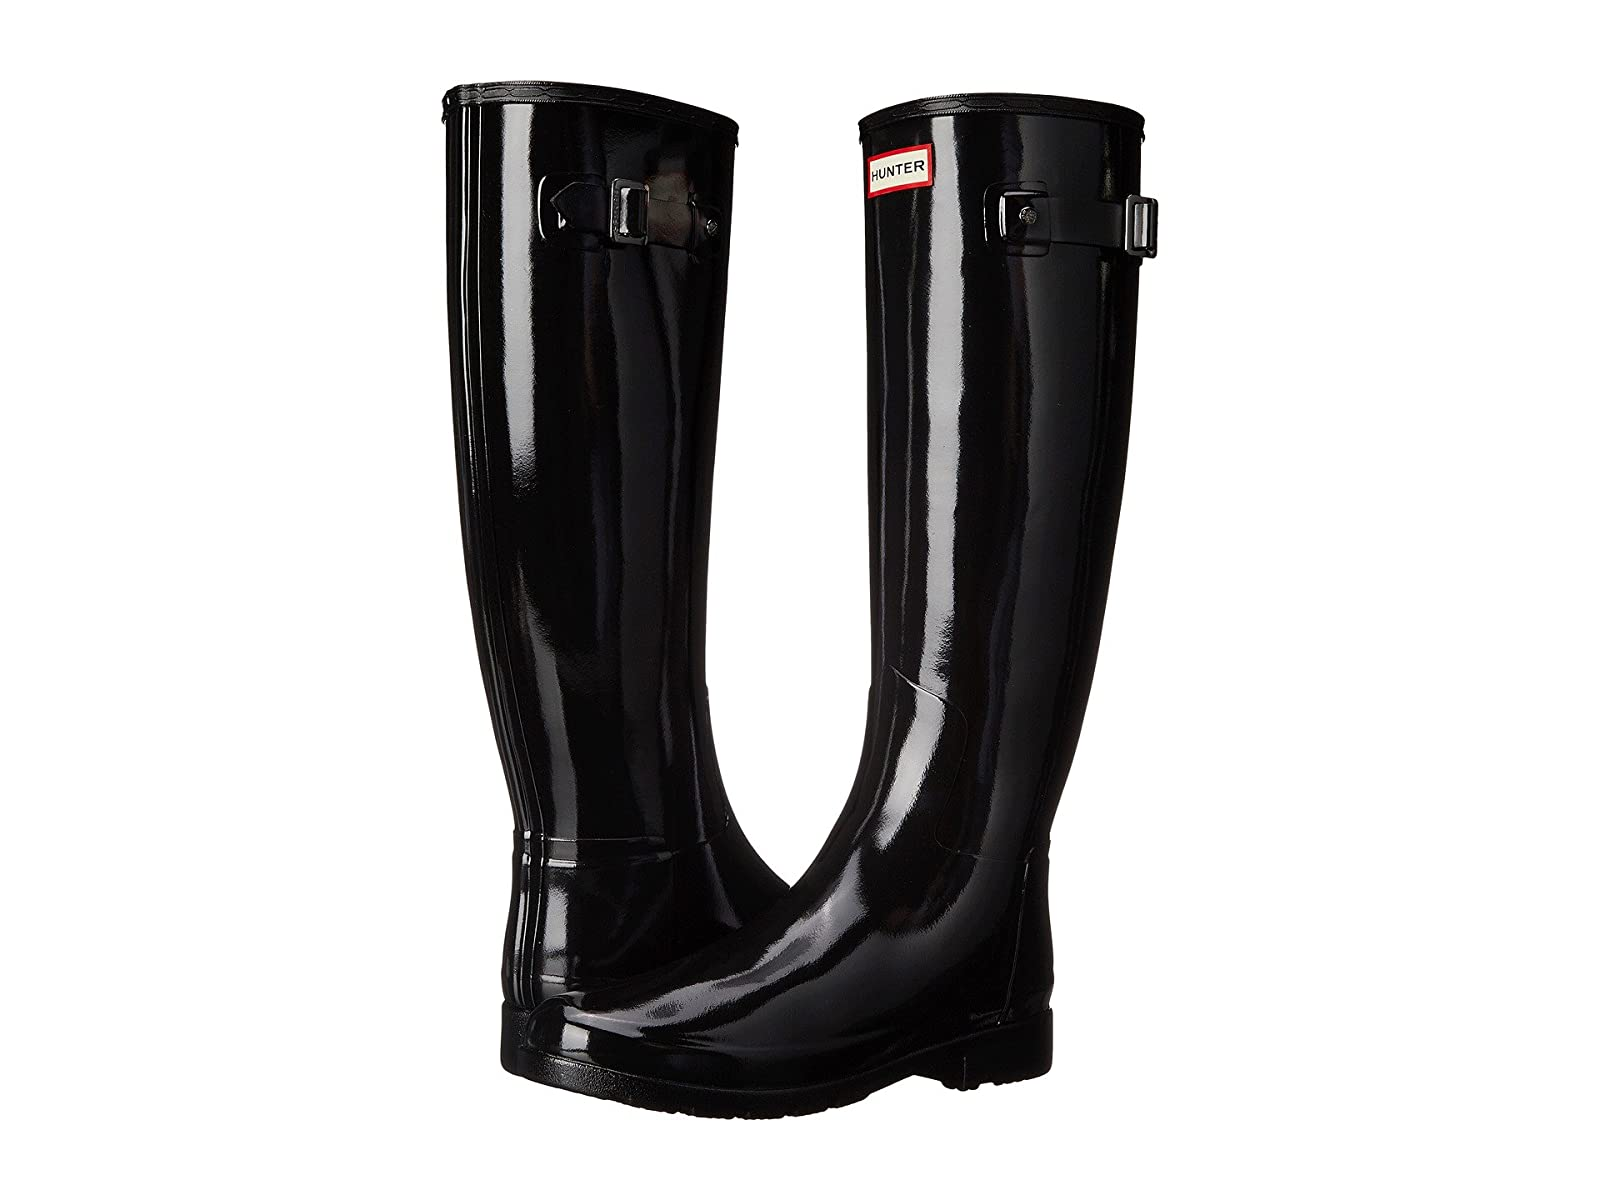 Hunter Original Refined Gloss Rain BootsAffordable and distinctive shoes